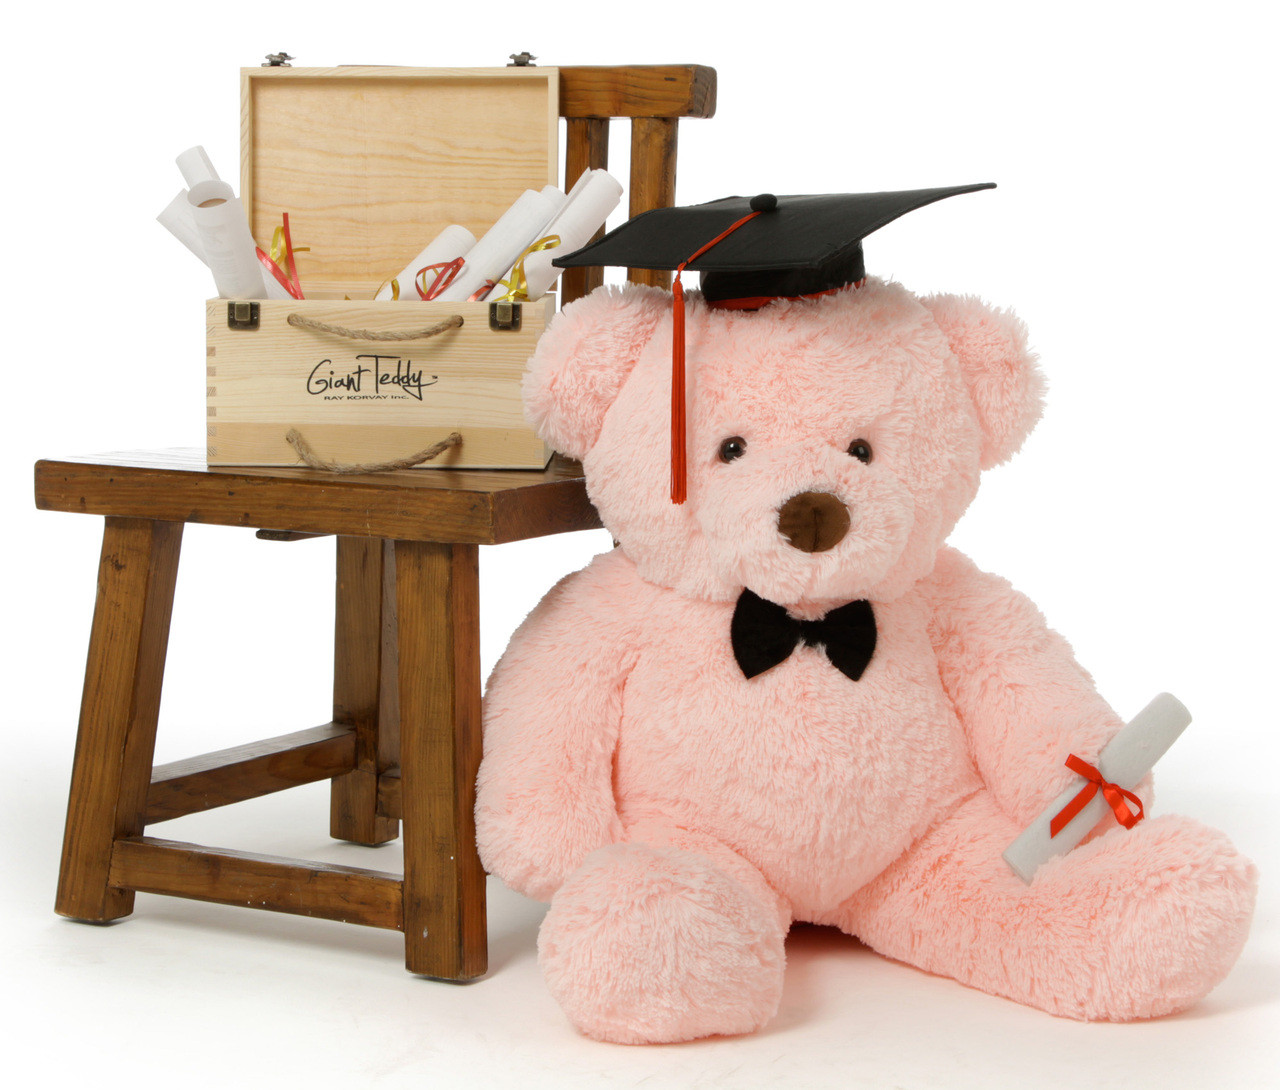 30in Huge Pink Gigi Chubs Teddy Bear with Graduation Cap & Diploma